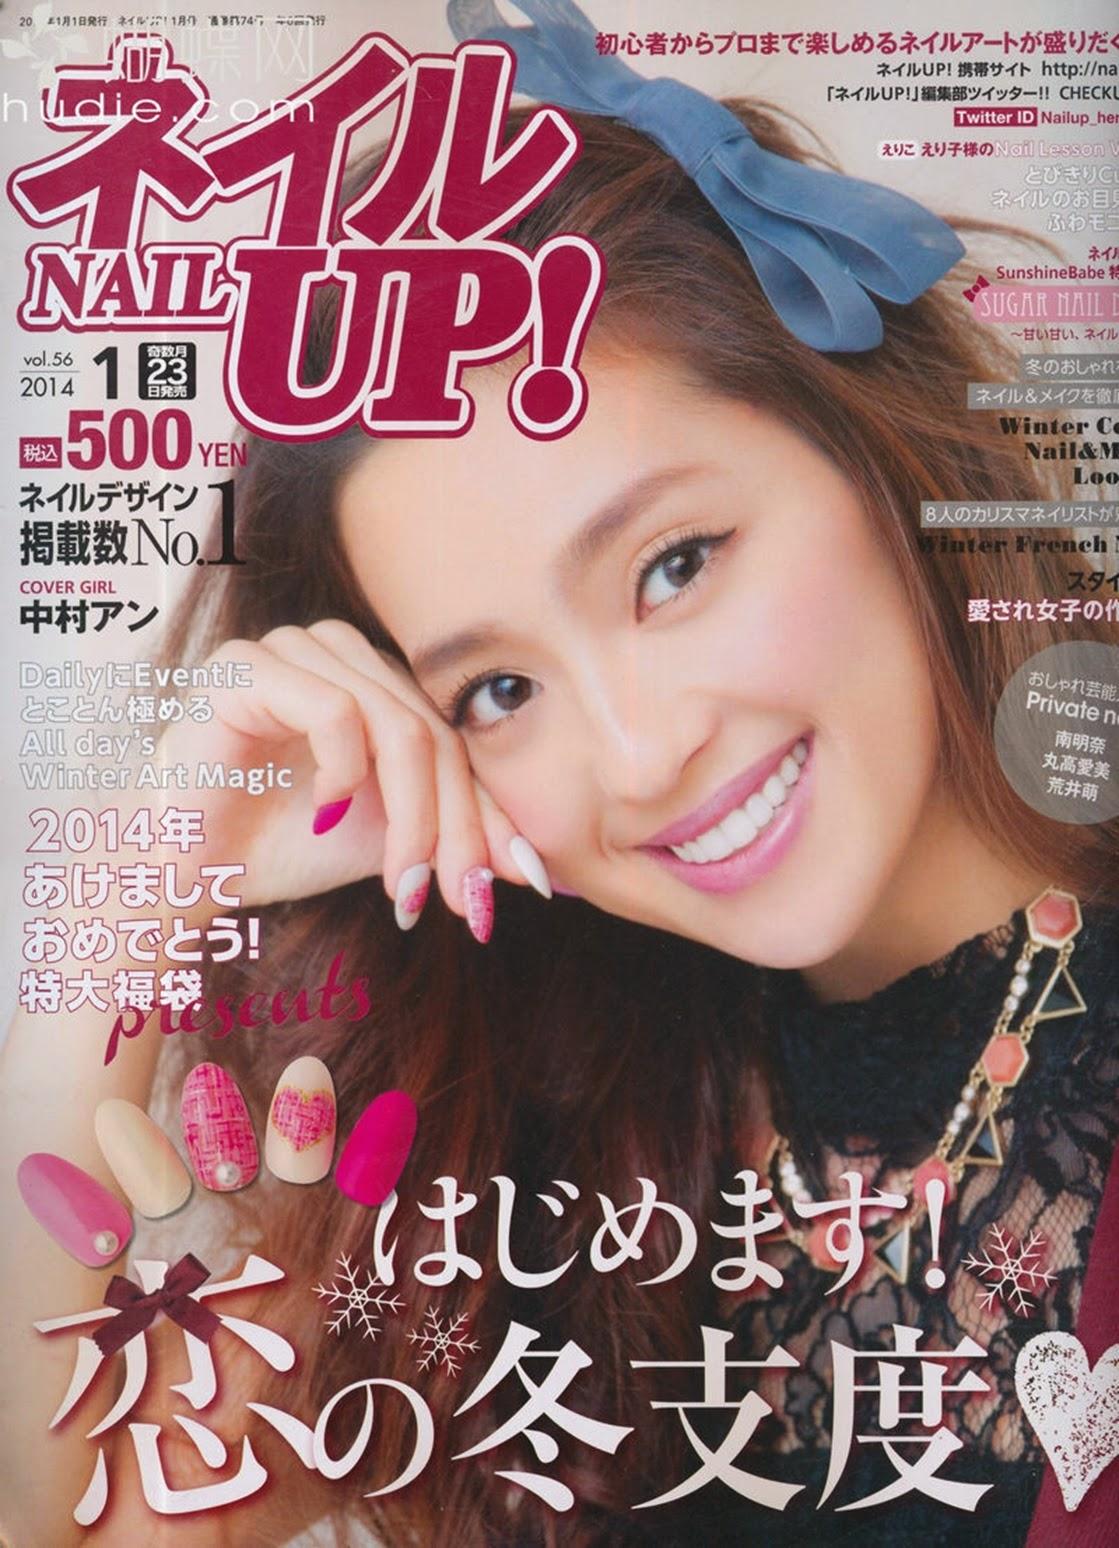 Scans | Nail Up! January 2014